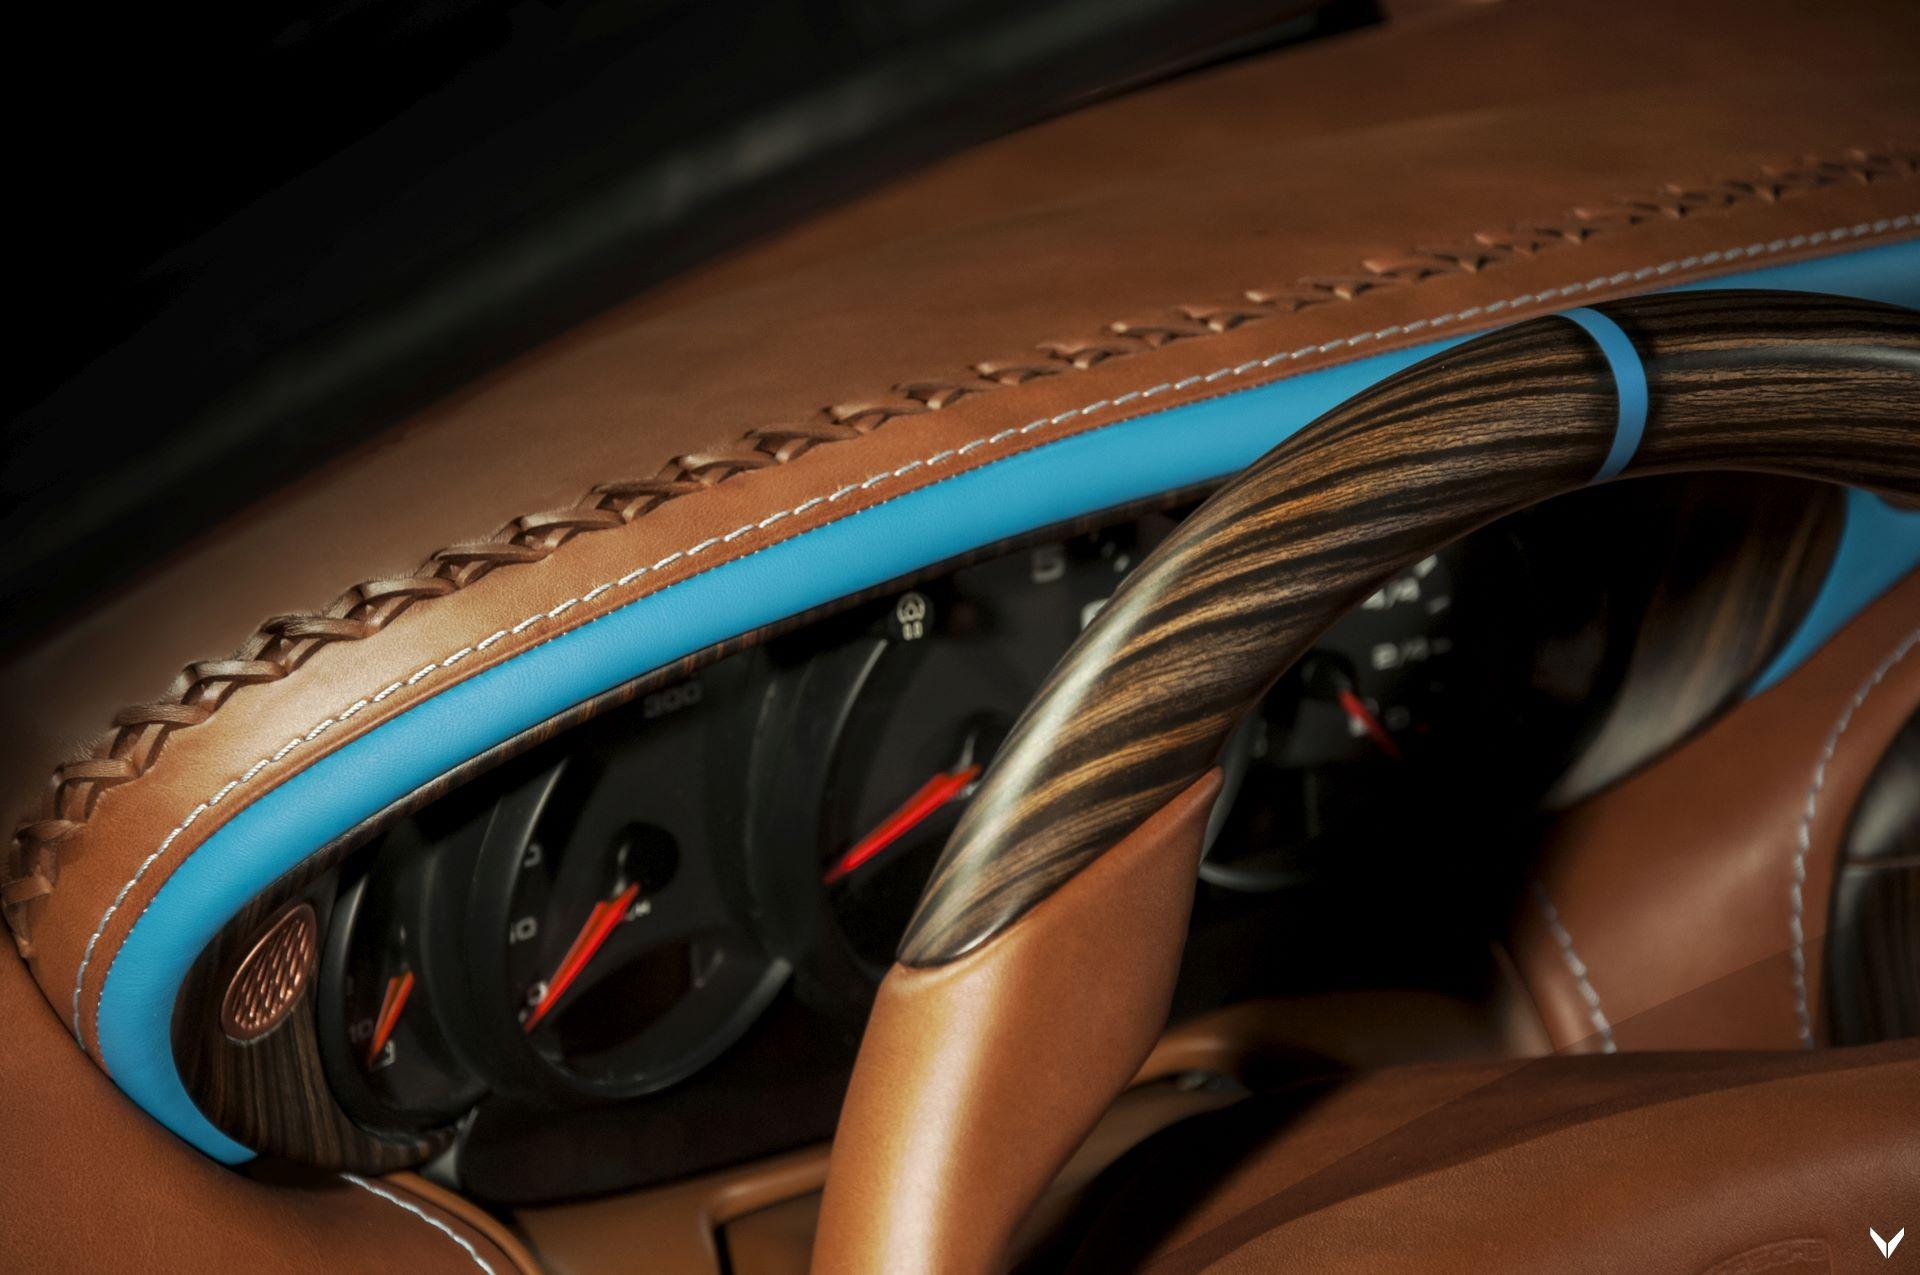 Porsche-911-Cabriolet-by-Vilner-22